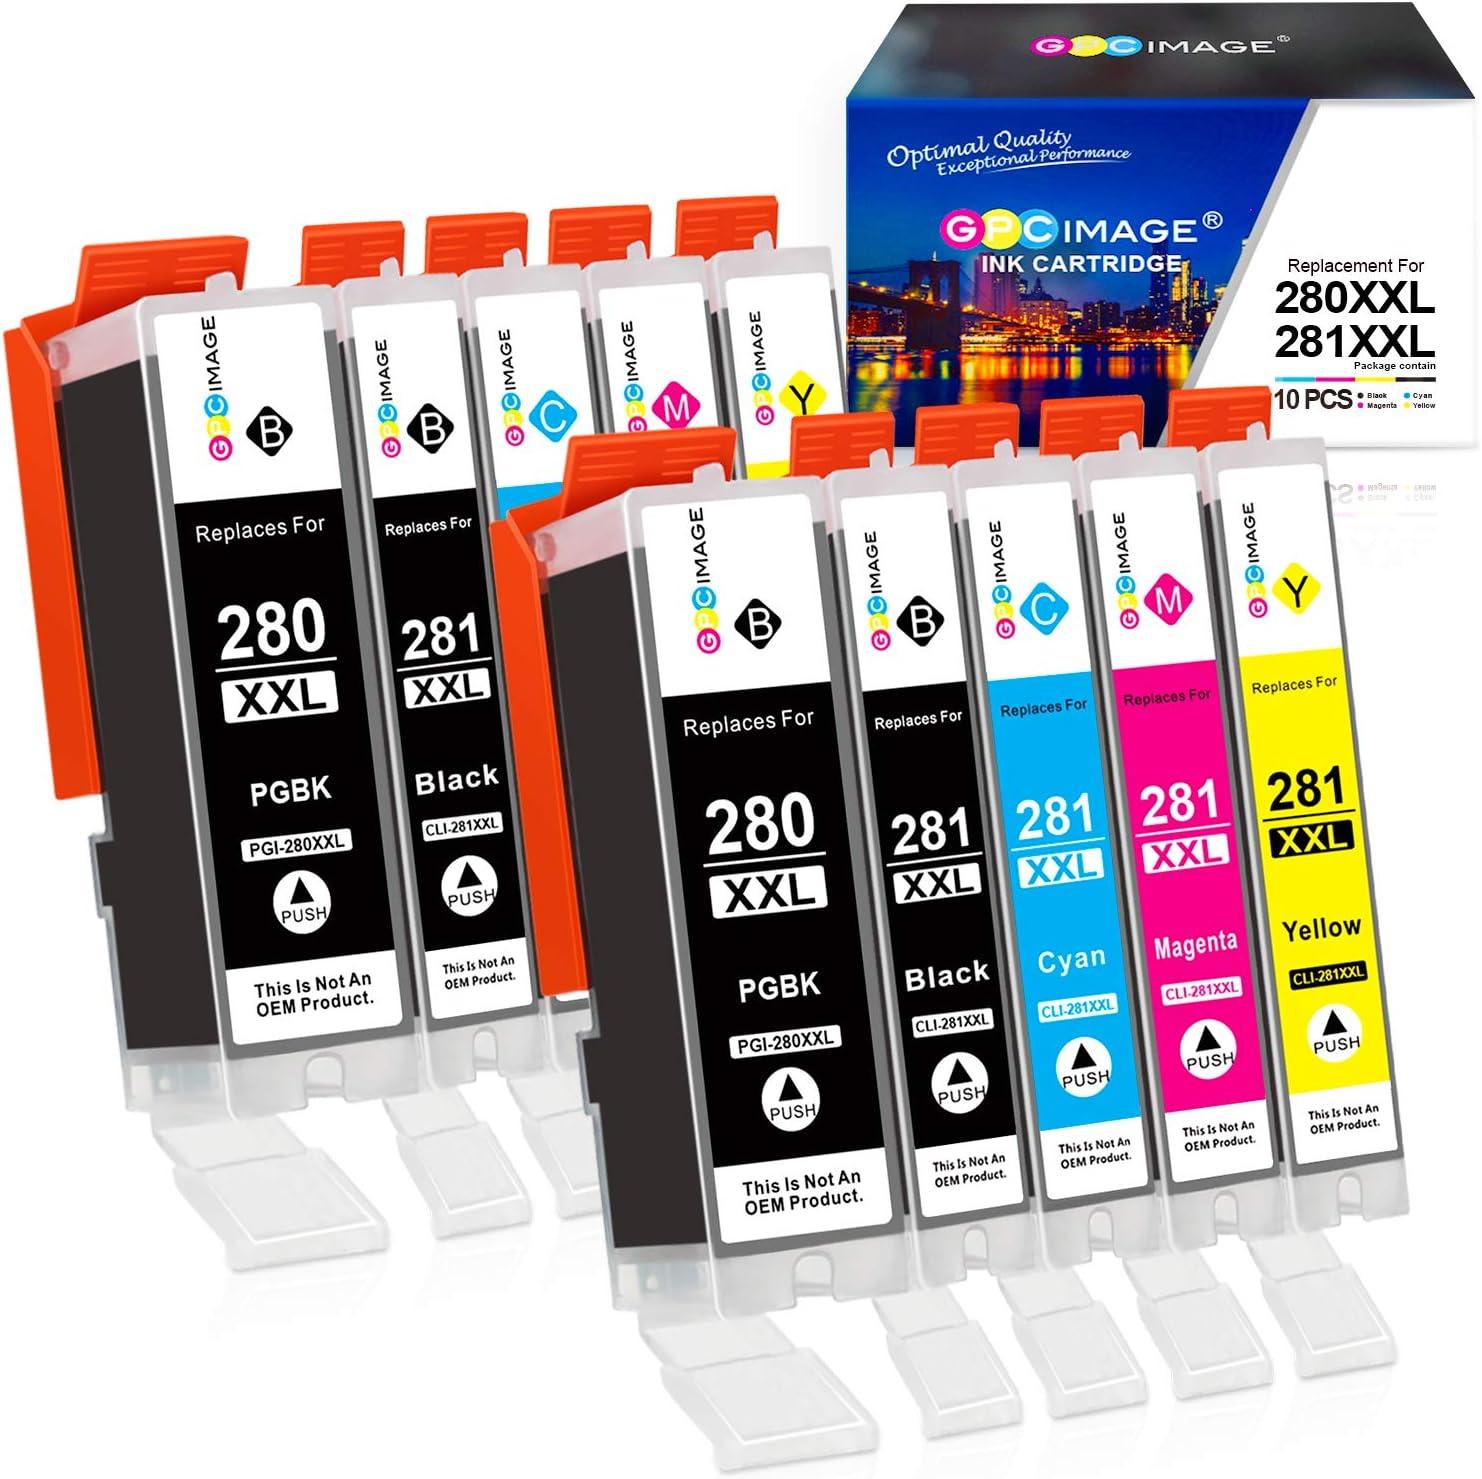 GPC Image Compatible Ink Cartridge Replacement for Canon PGI-280XXL CLI-281XXL 280 XXL CLI 281 XXL fit for PIXMA TS6120 TS6220 TR7520 TR8520 TS8120 TS8220 TS9120 TS9520 TS9521C Printer Tray (10 Pack)